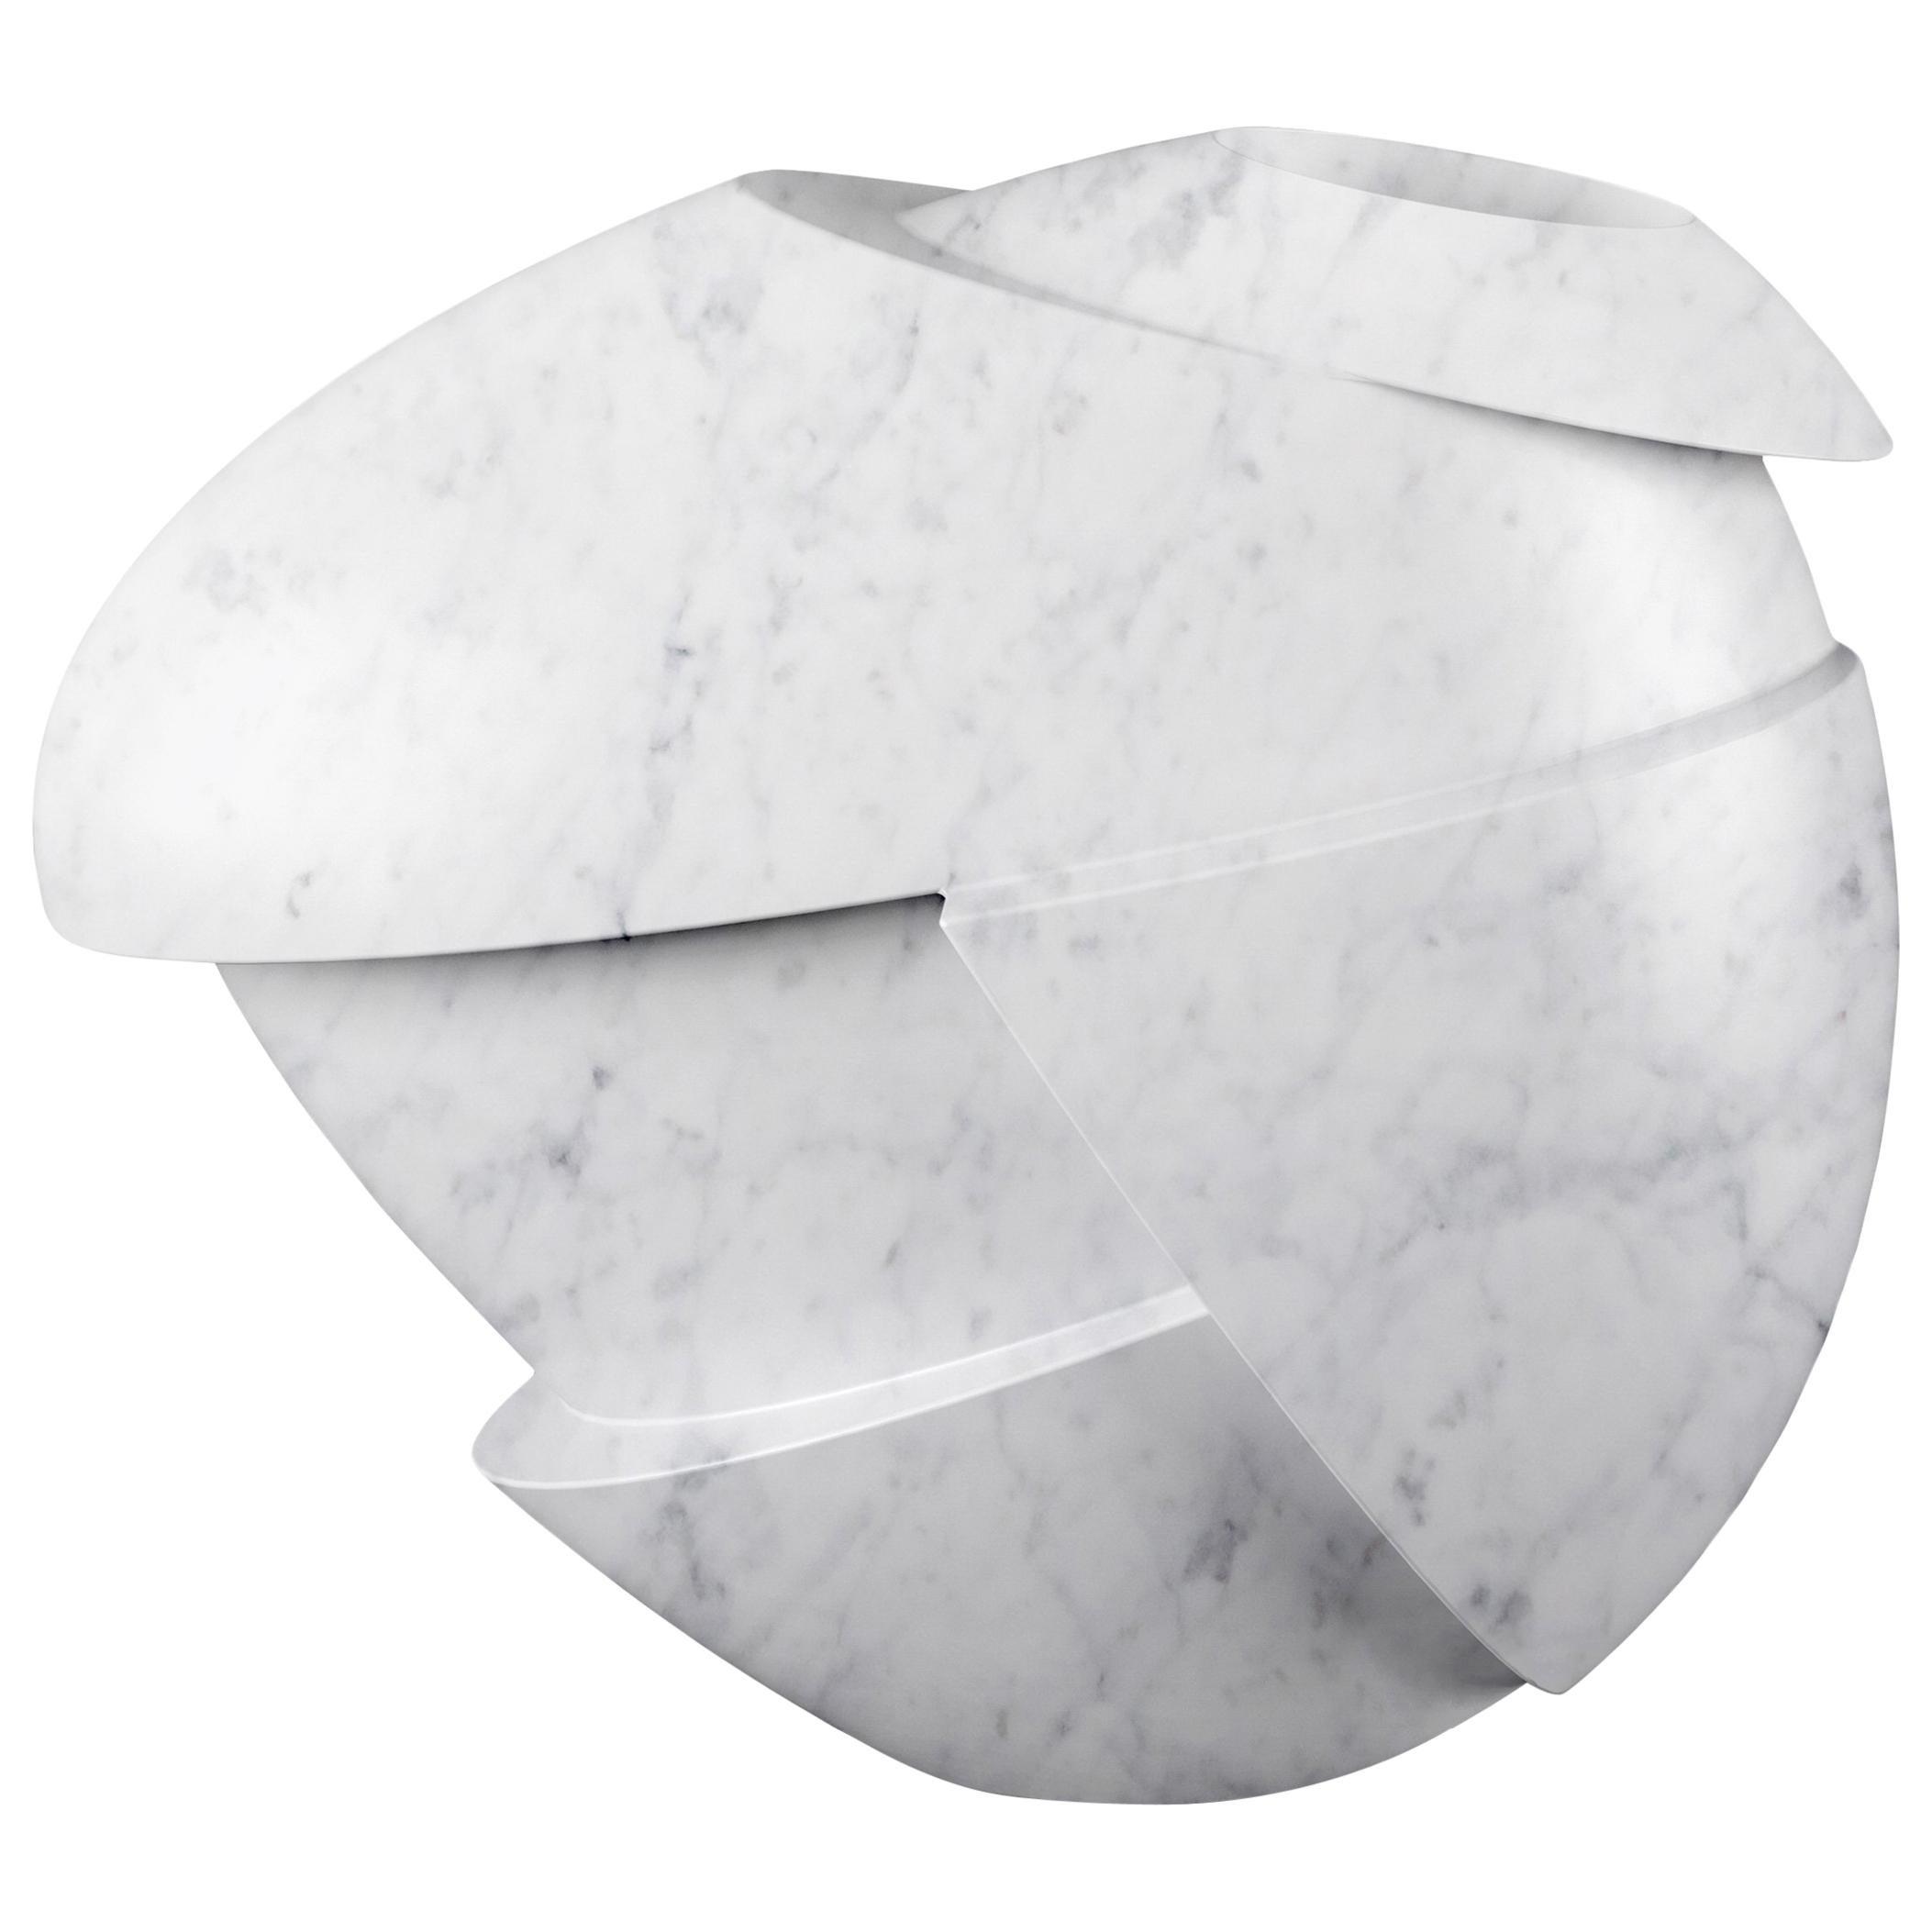 Vase Sculpture White Carrara Marble Contemporary Italian Design